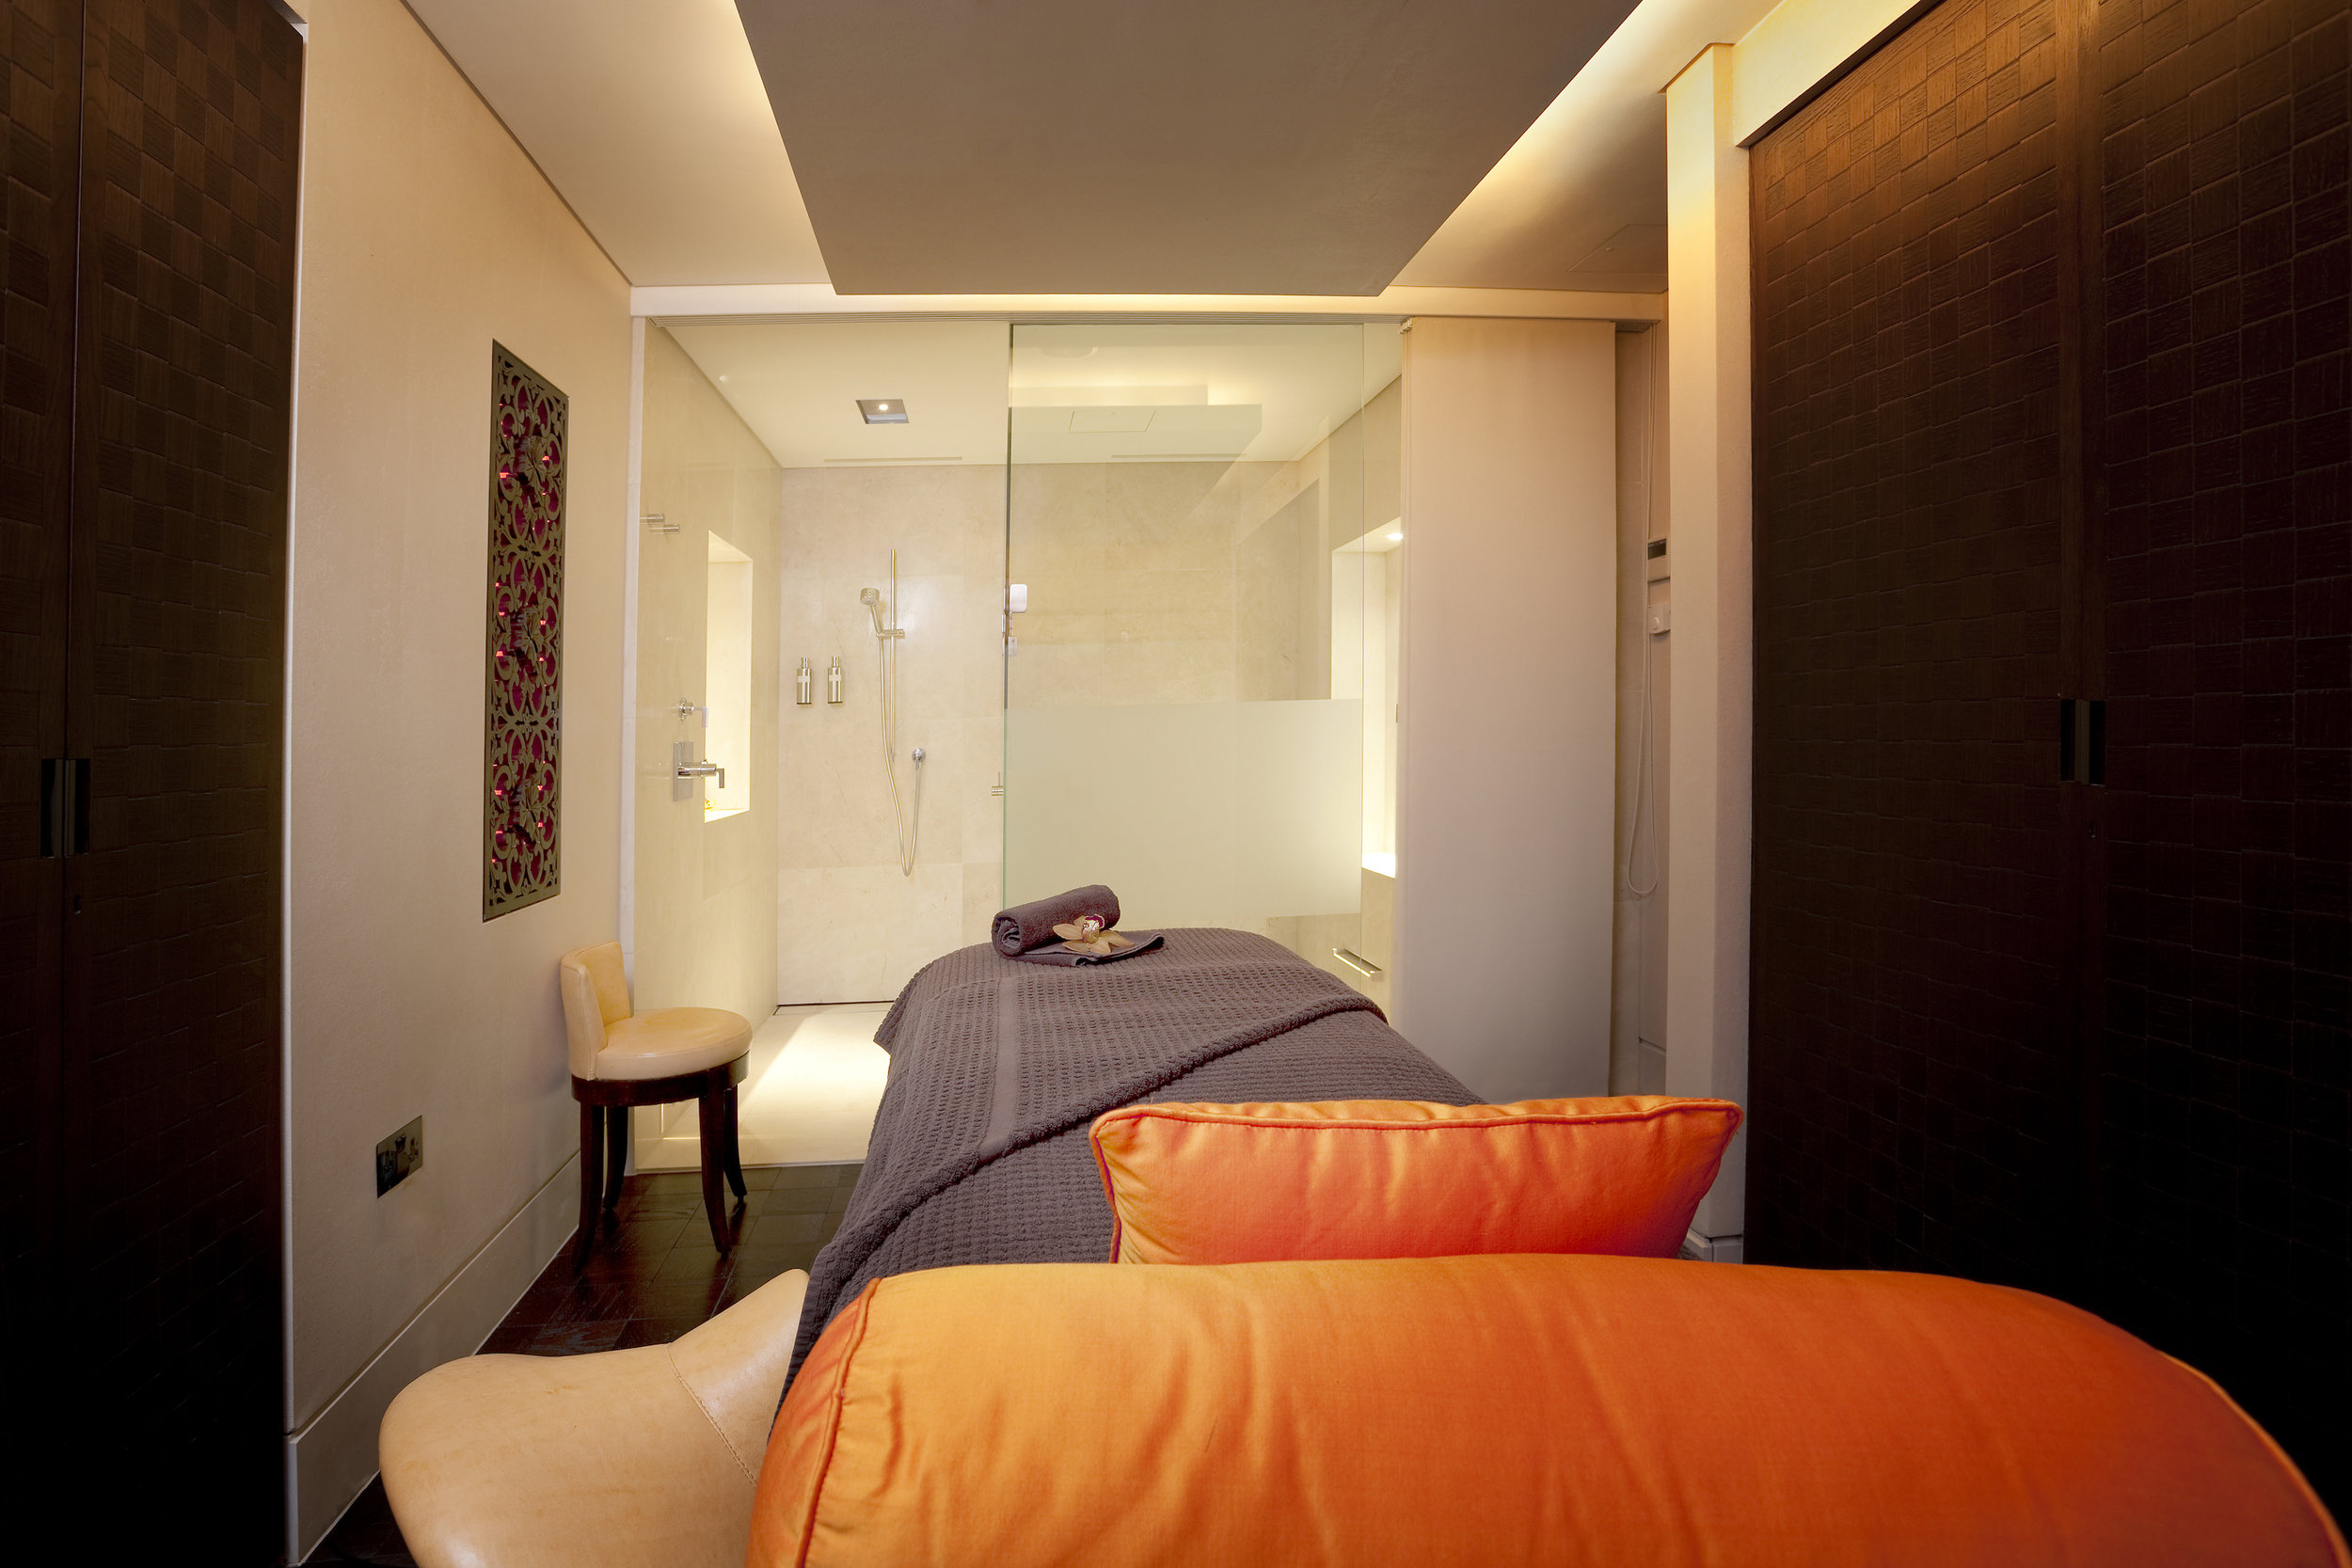 Ushvani Treatment Room _MG_6460 copy.jpg